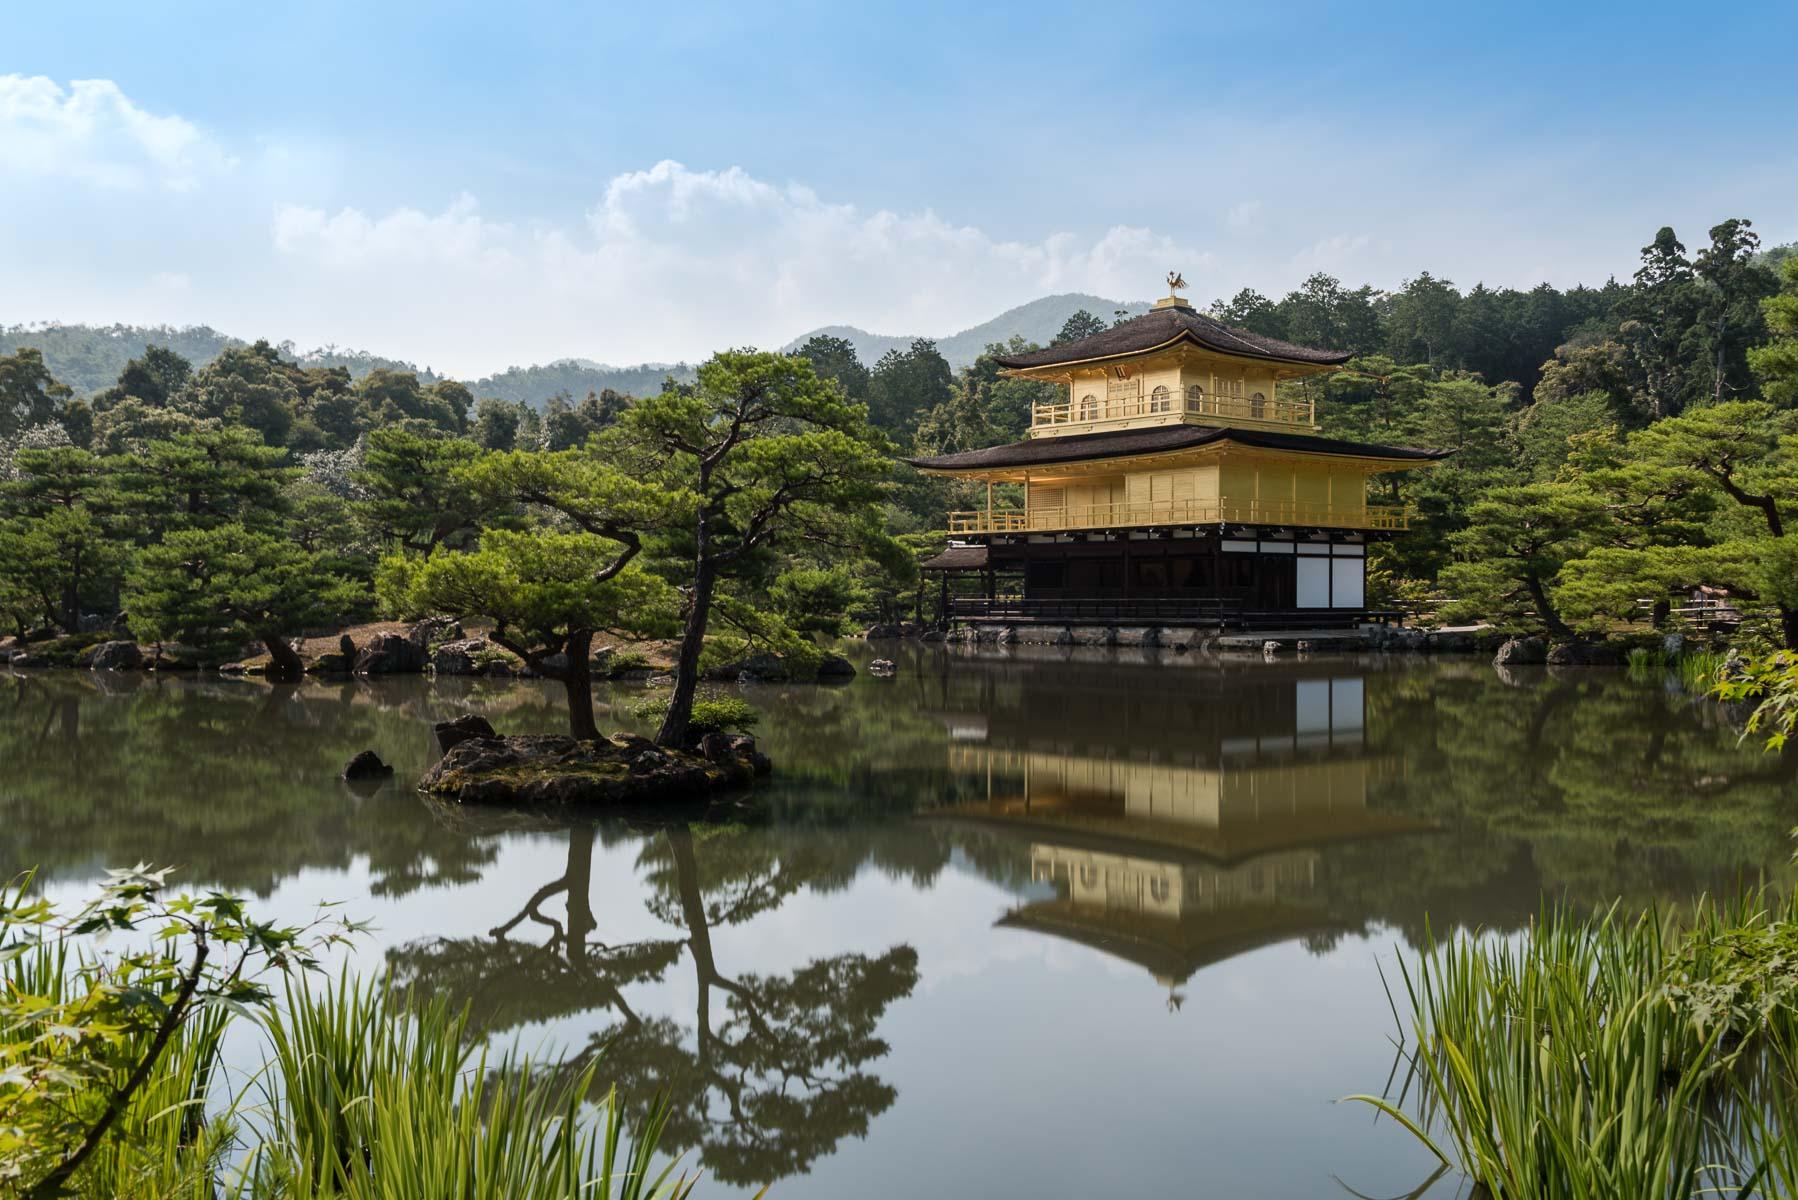 Christian Meixner Fotografie, Fotograf Zürich, Japan, Kyoto, Reisen, Reisefotografie